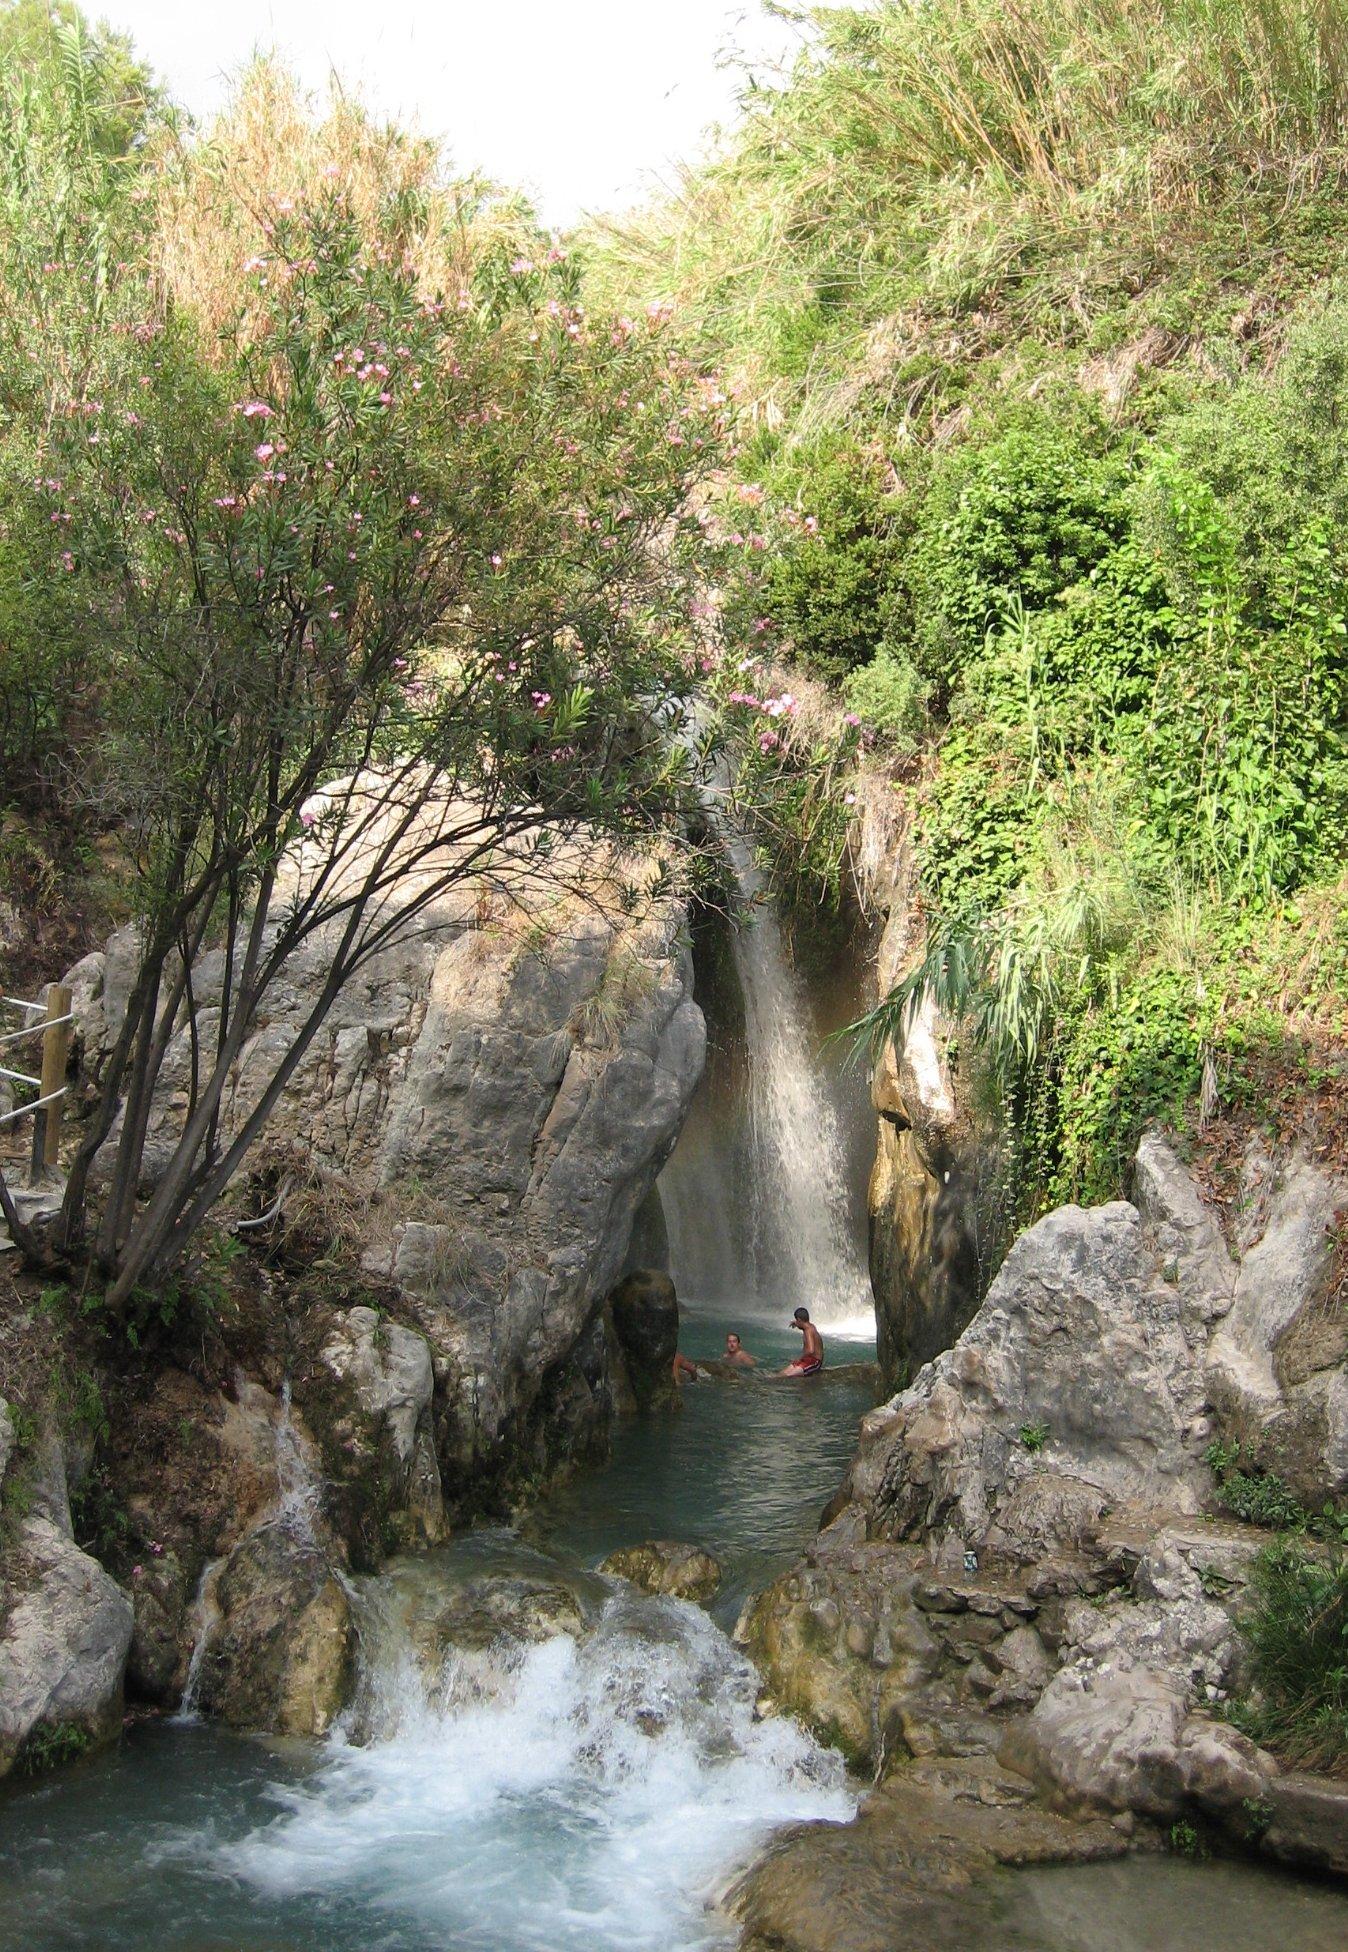 piscinas naturales en murcia amazing piscinas naturales